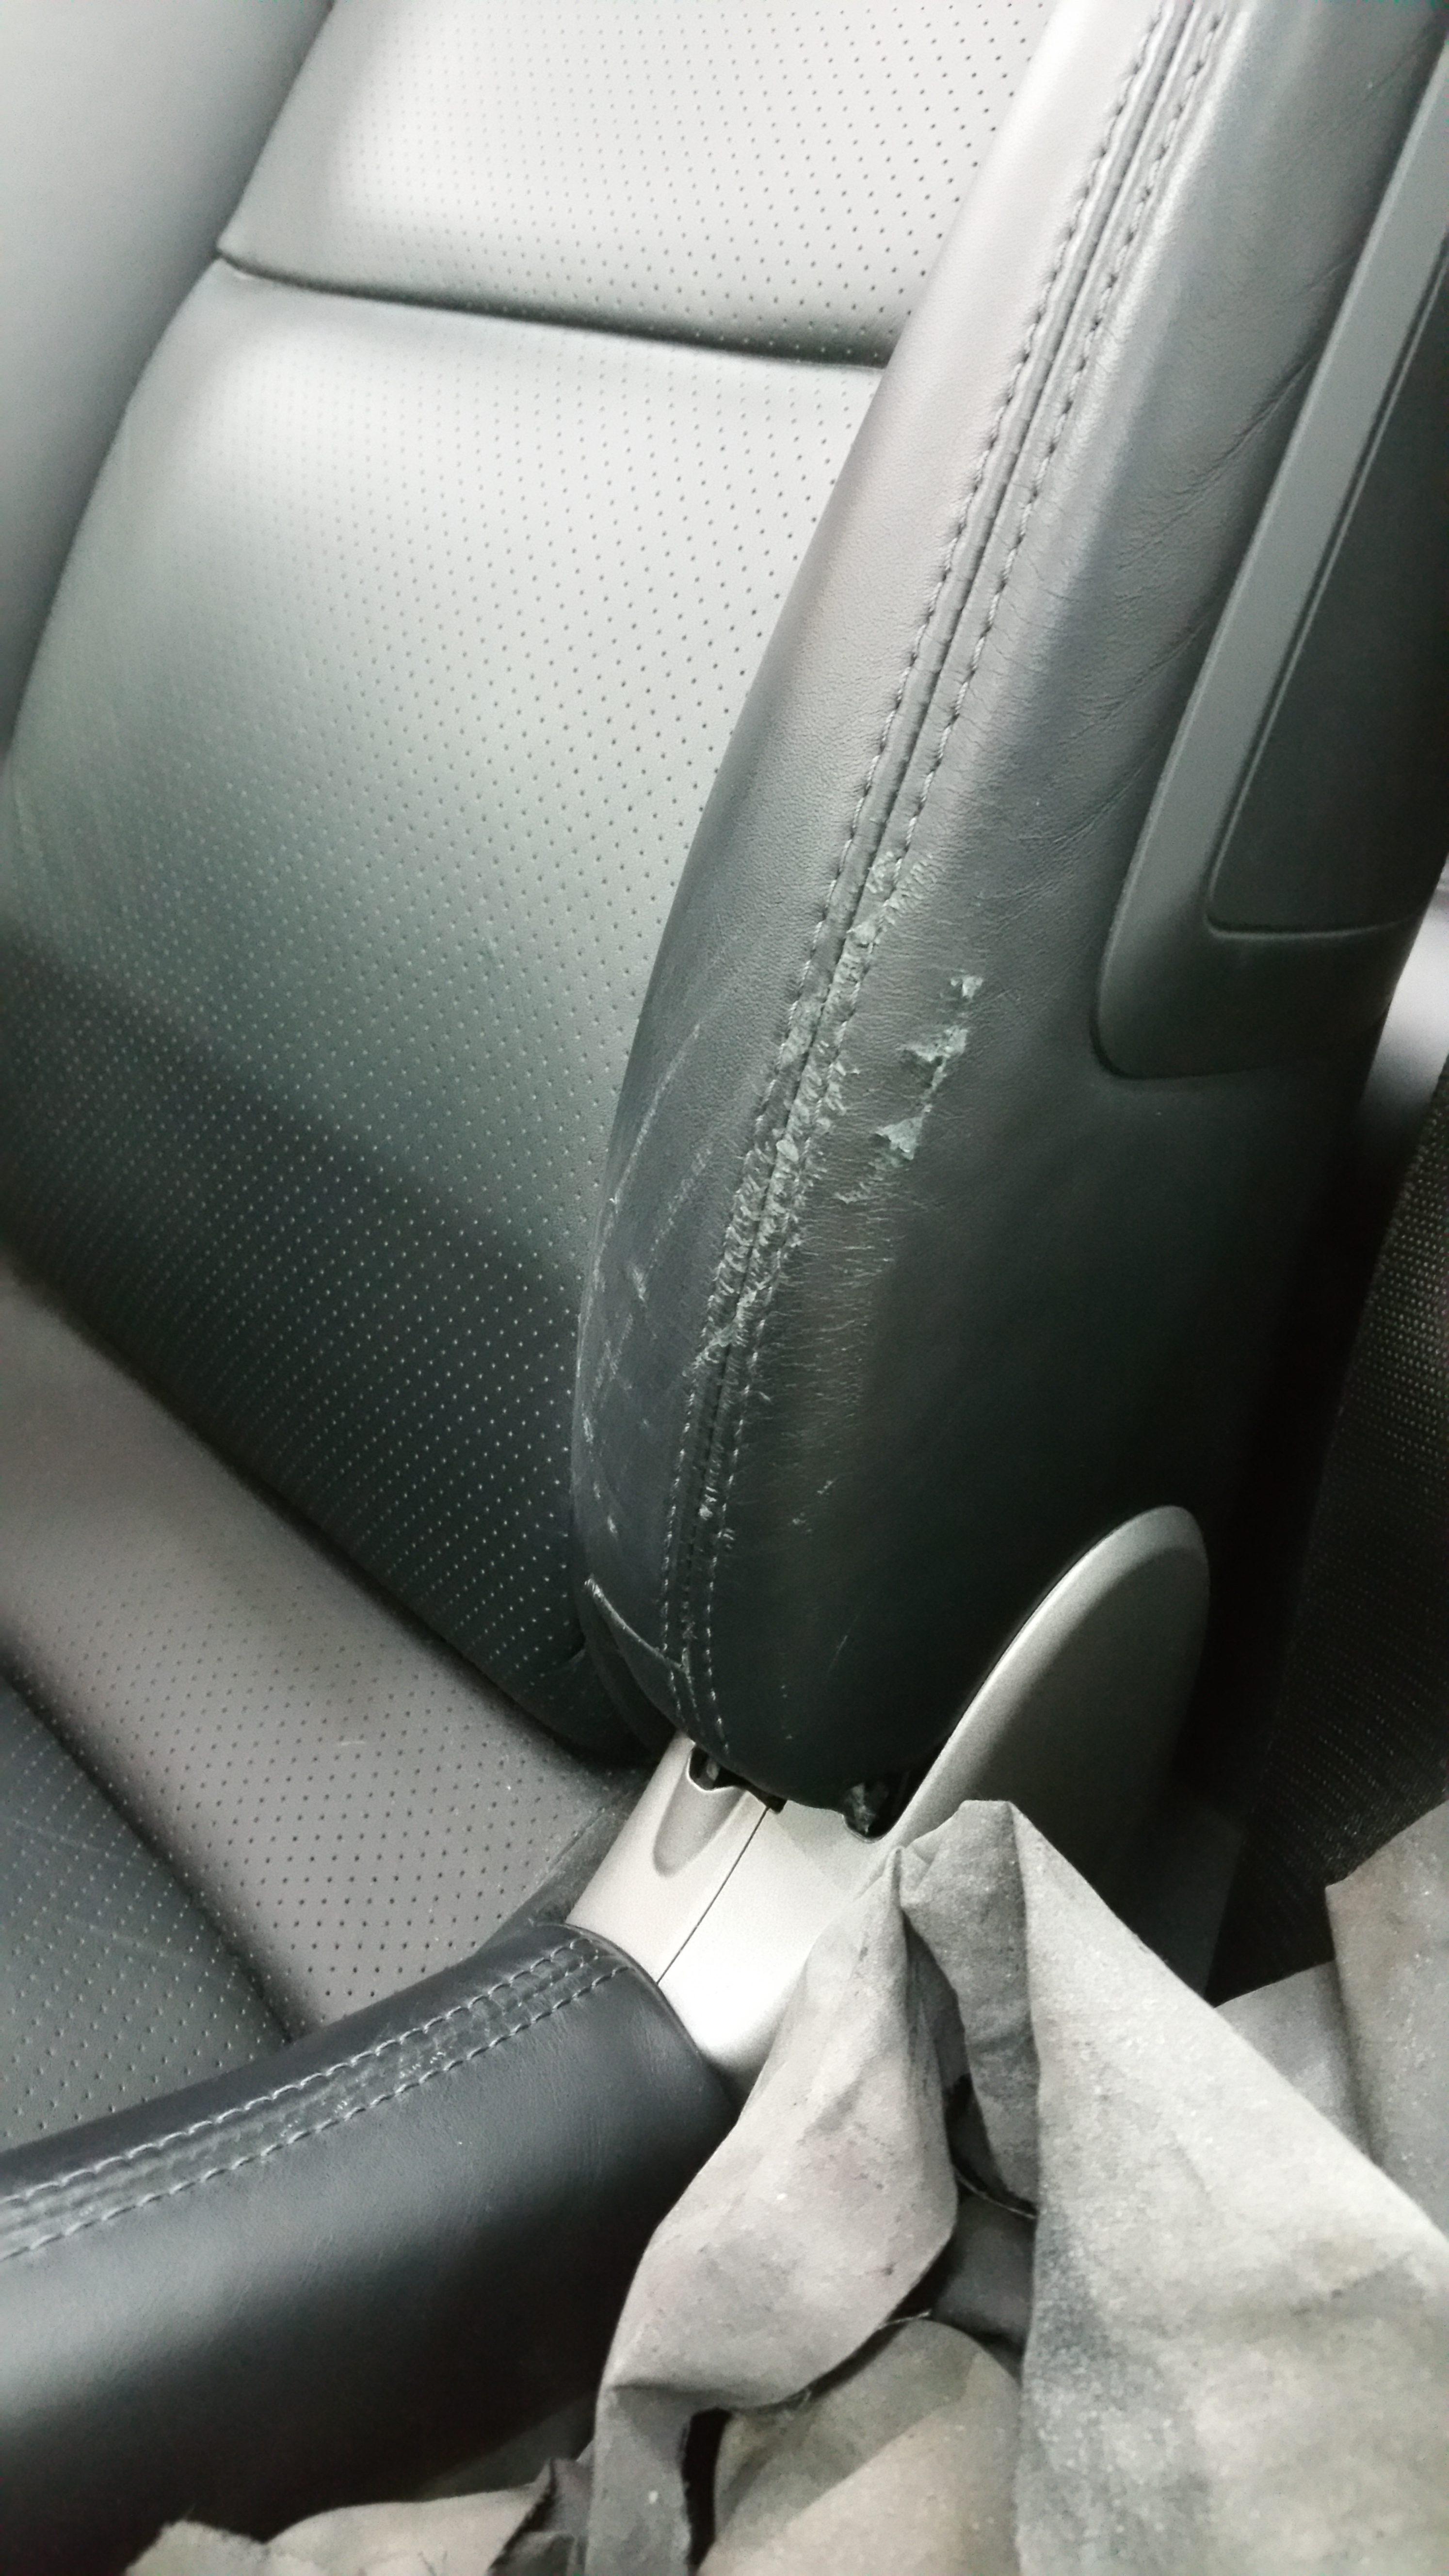 stoel lendensteun beschadigd auto interieur